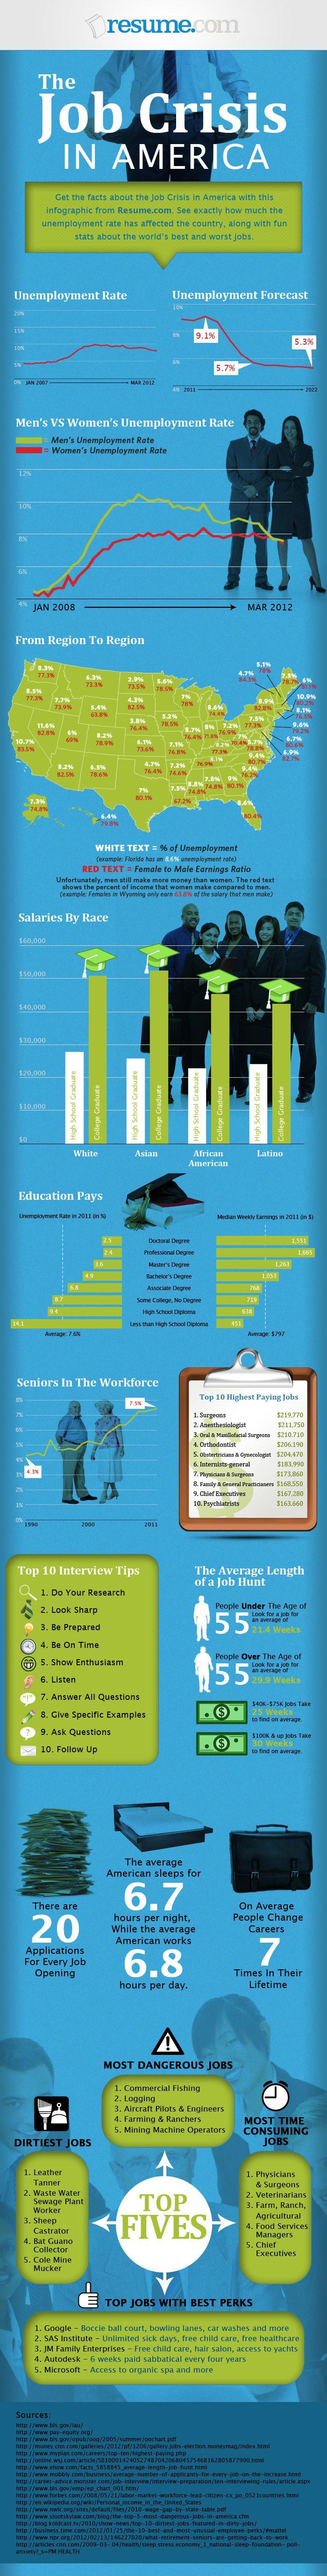 www.career-innovate.com